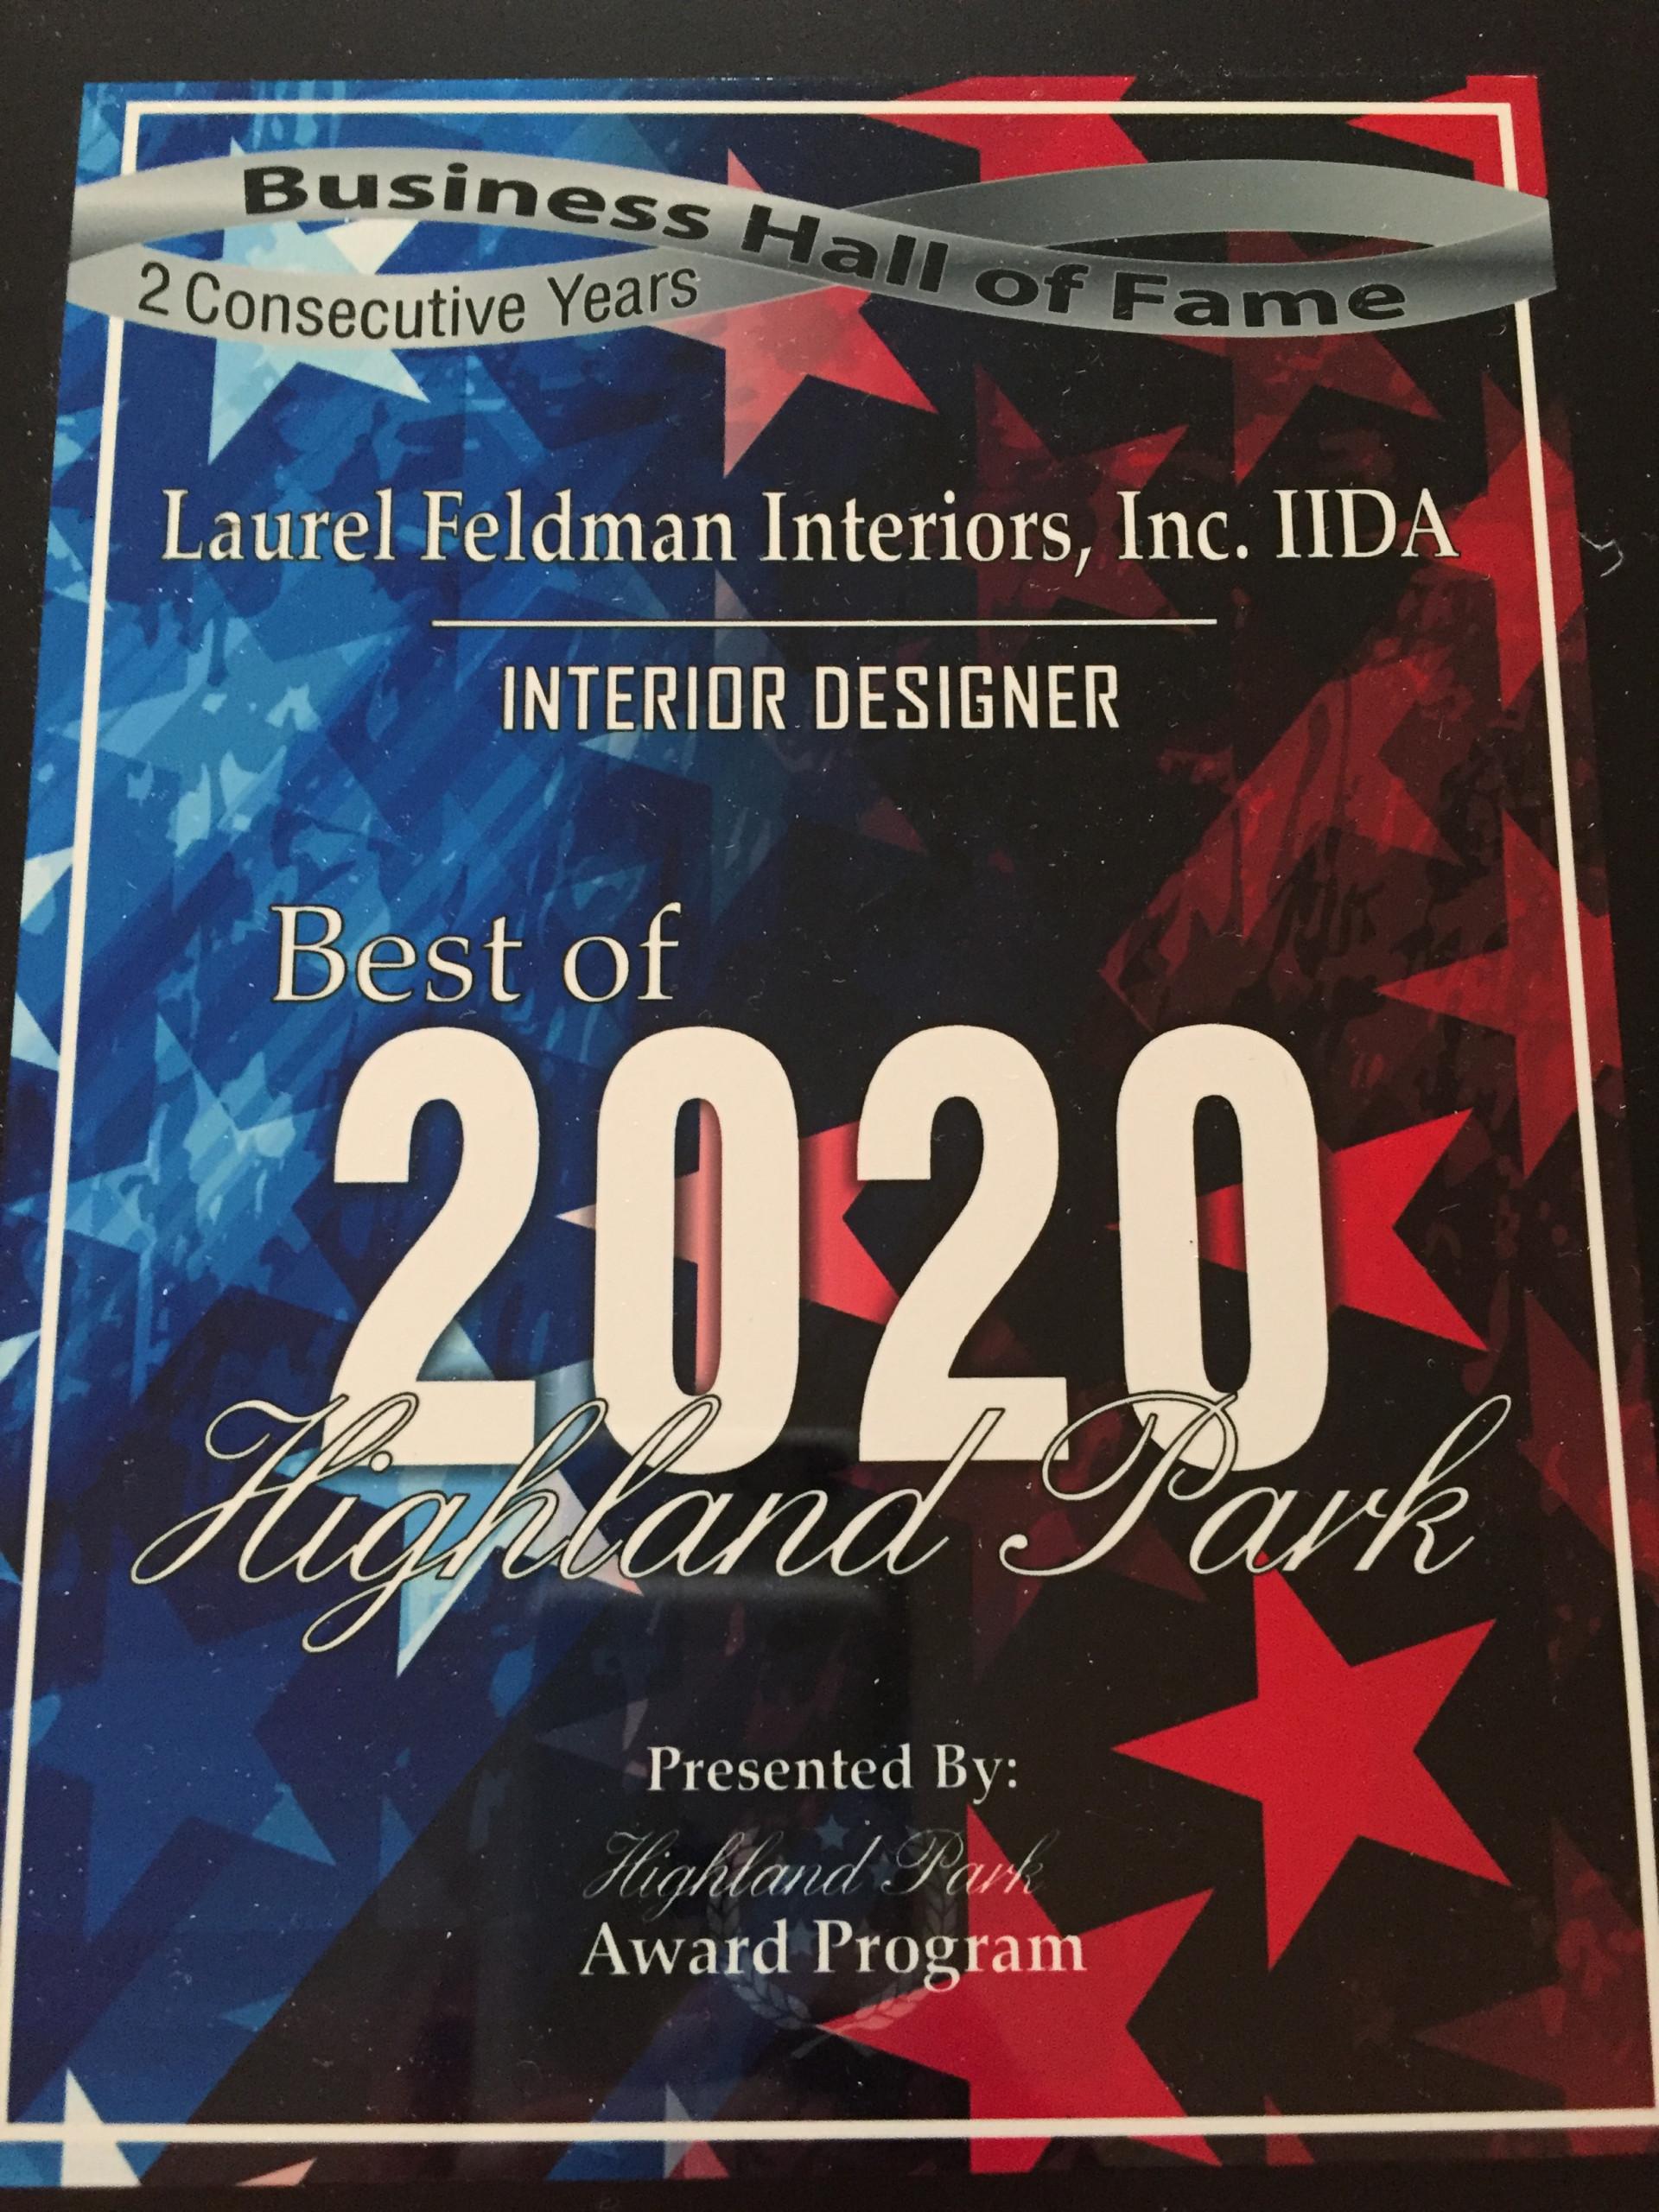 BEST OF 2020 HIGHLAND PARK INTERIOR DESIGNER